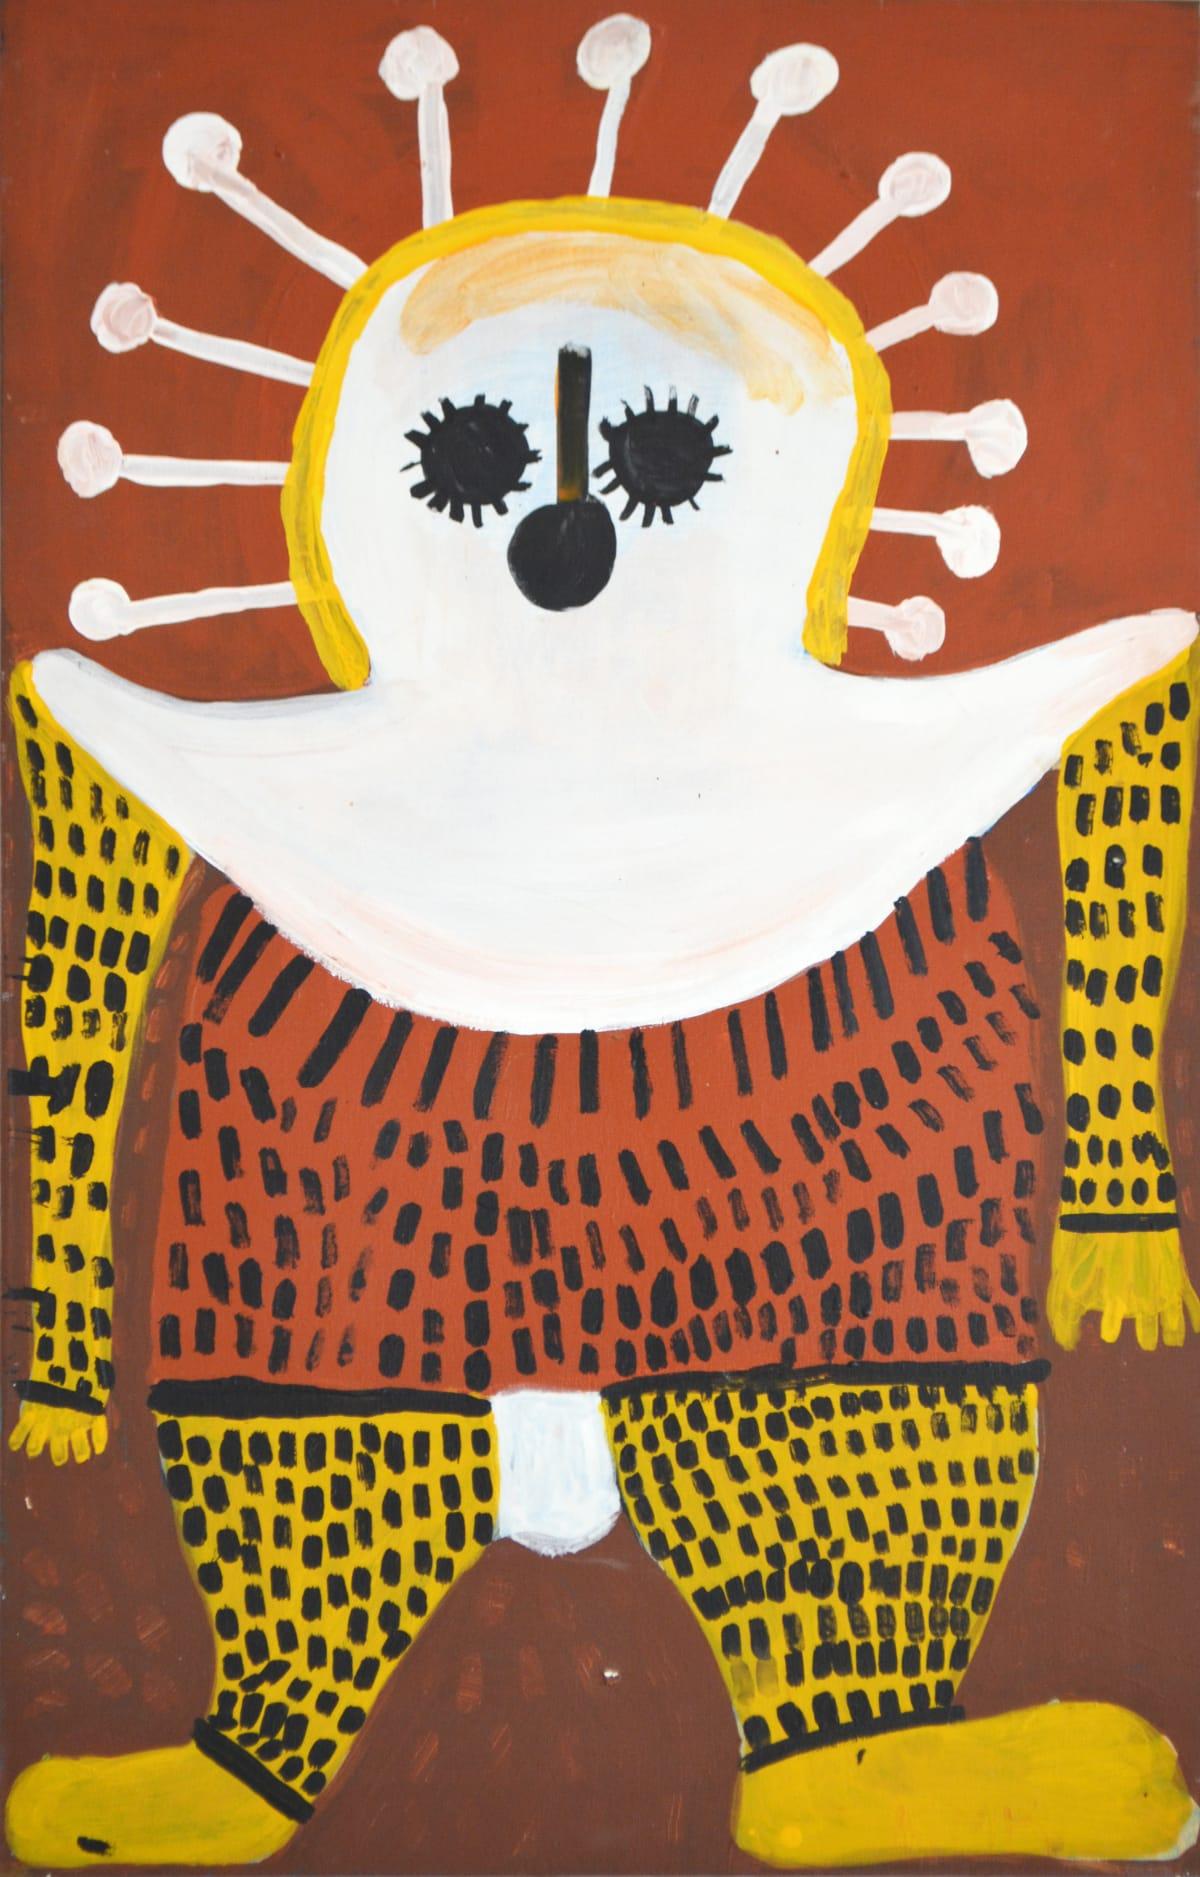 Mabel King Wandjina acrylic on canvas 88 x 55 cm